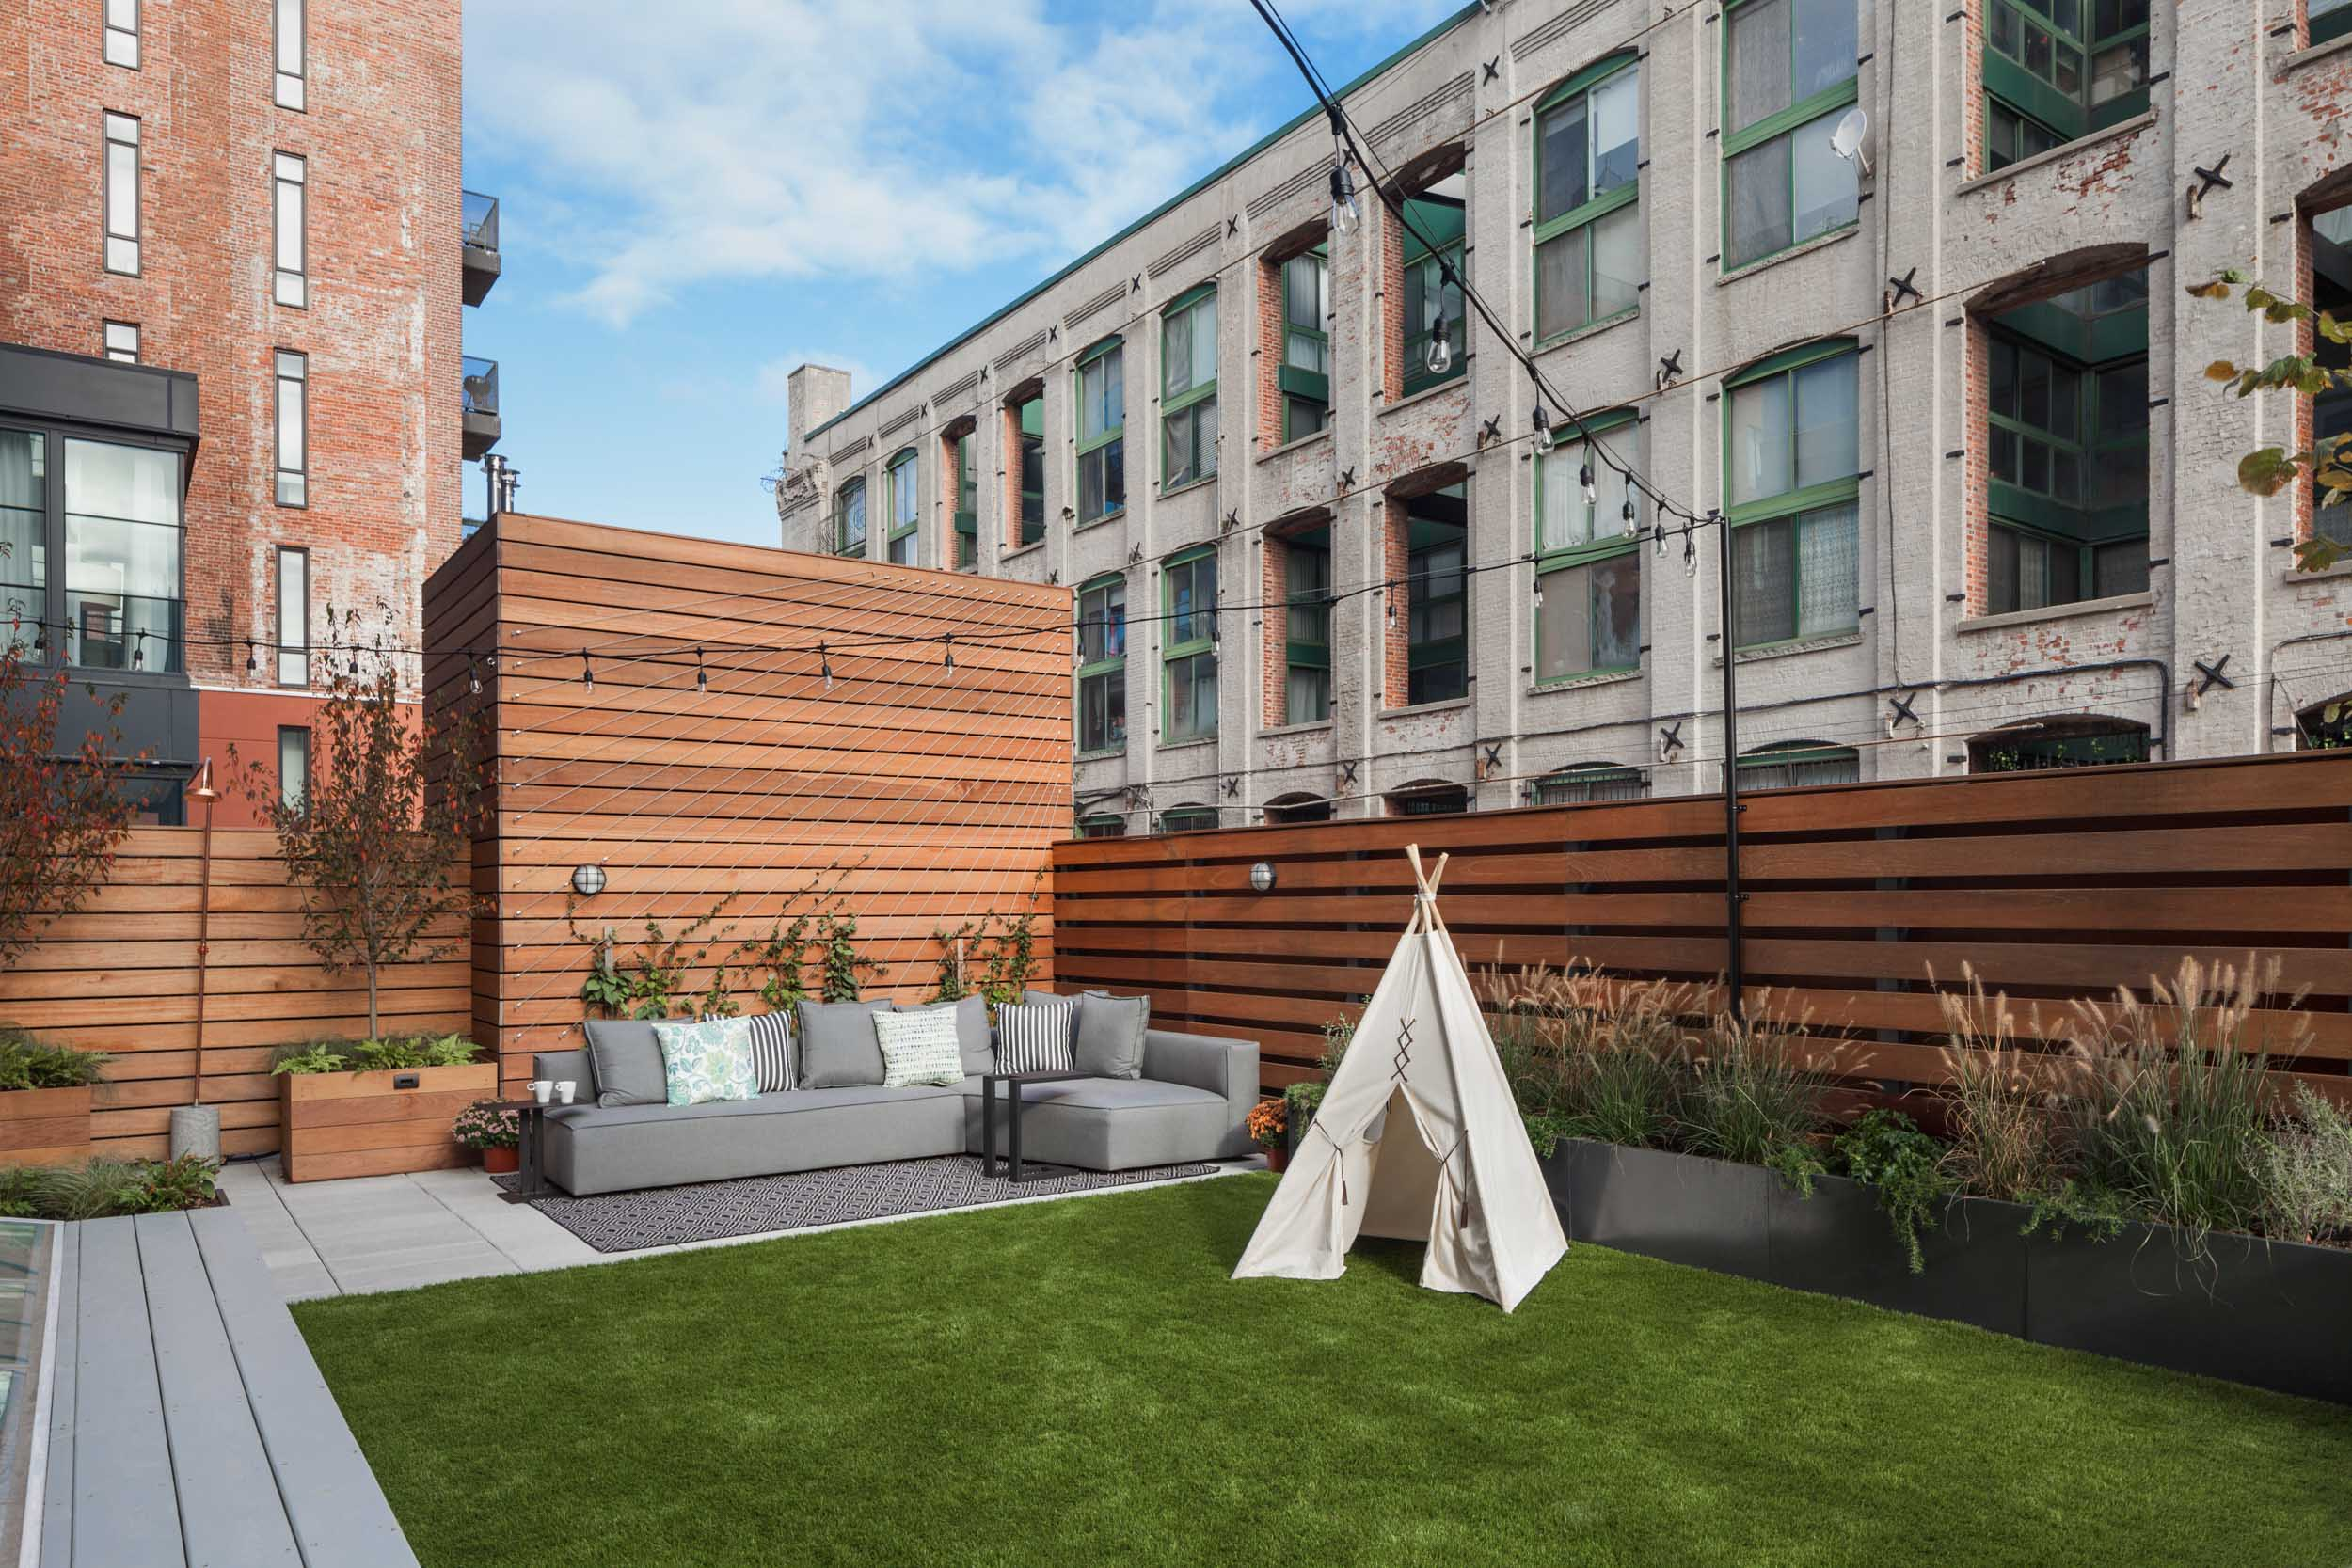 Landscape Design Architecture Brooklyn Nyc